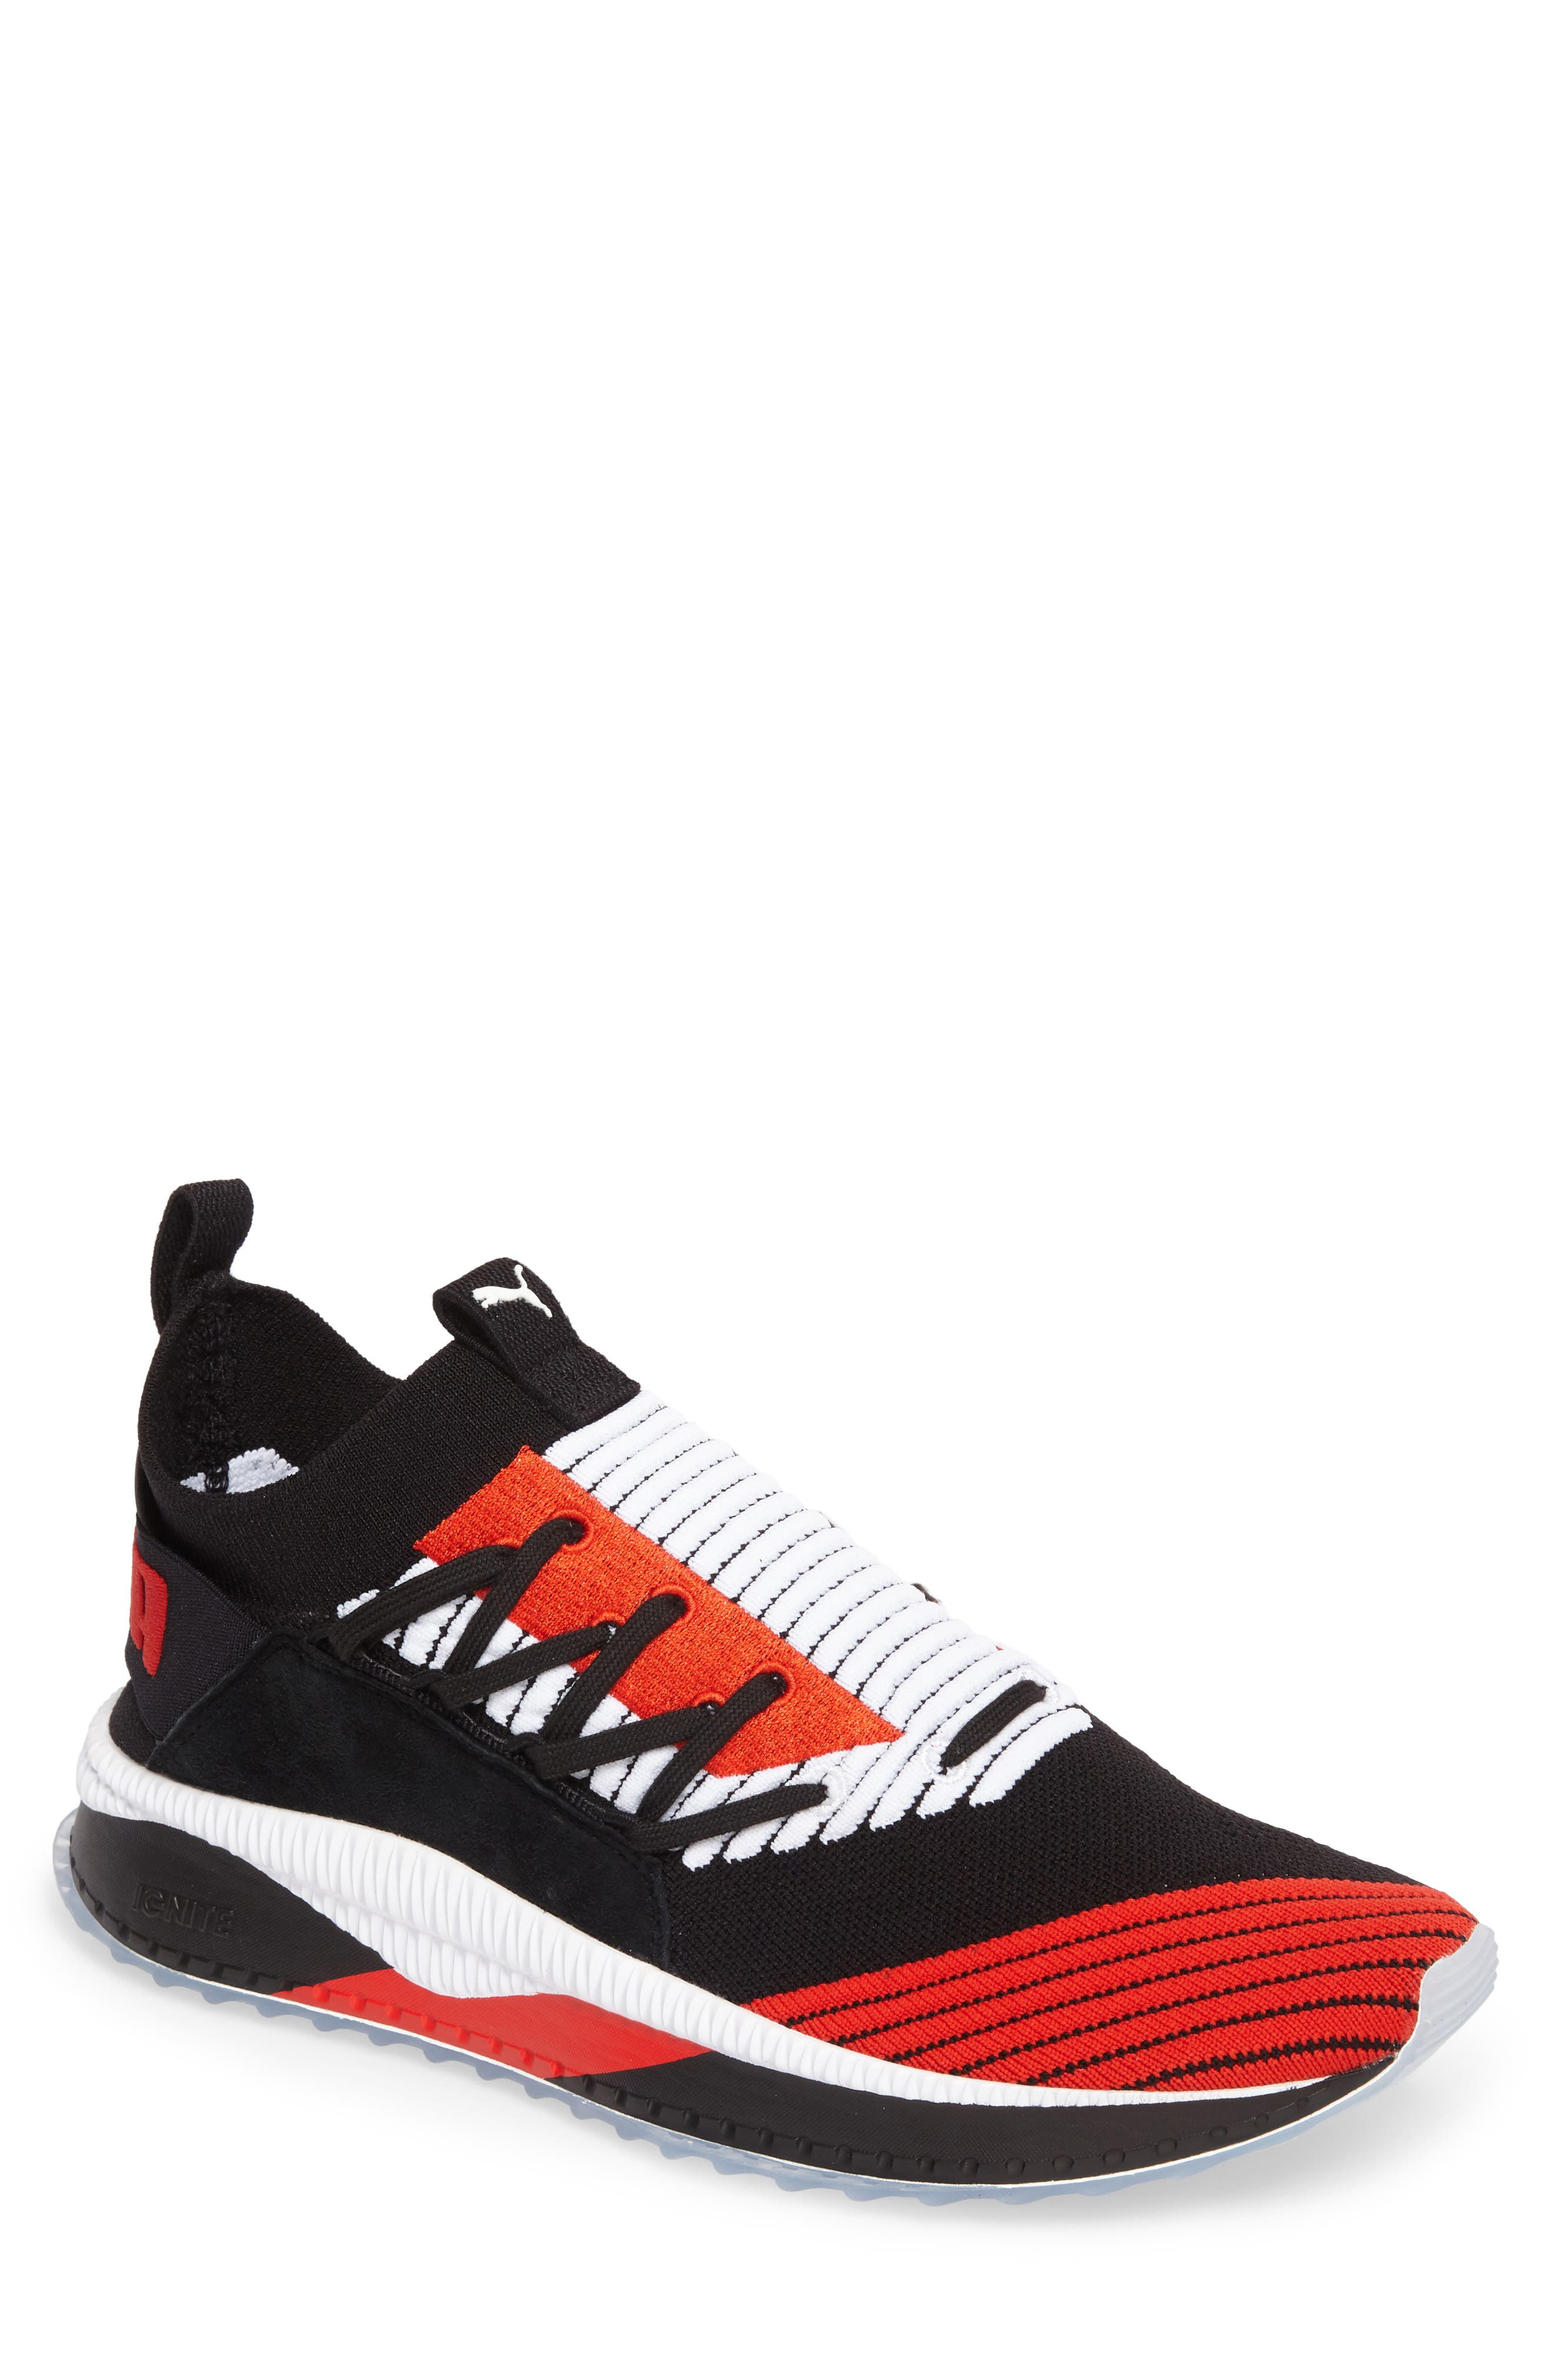 Tsugi Shinsei UT Odyssey Sneaker,                             Main thumbnail 1, color,                             010